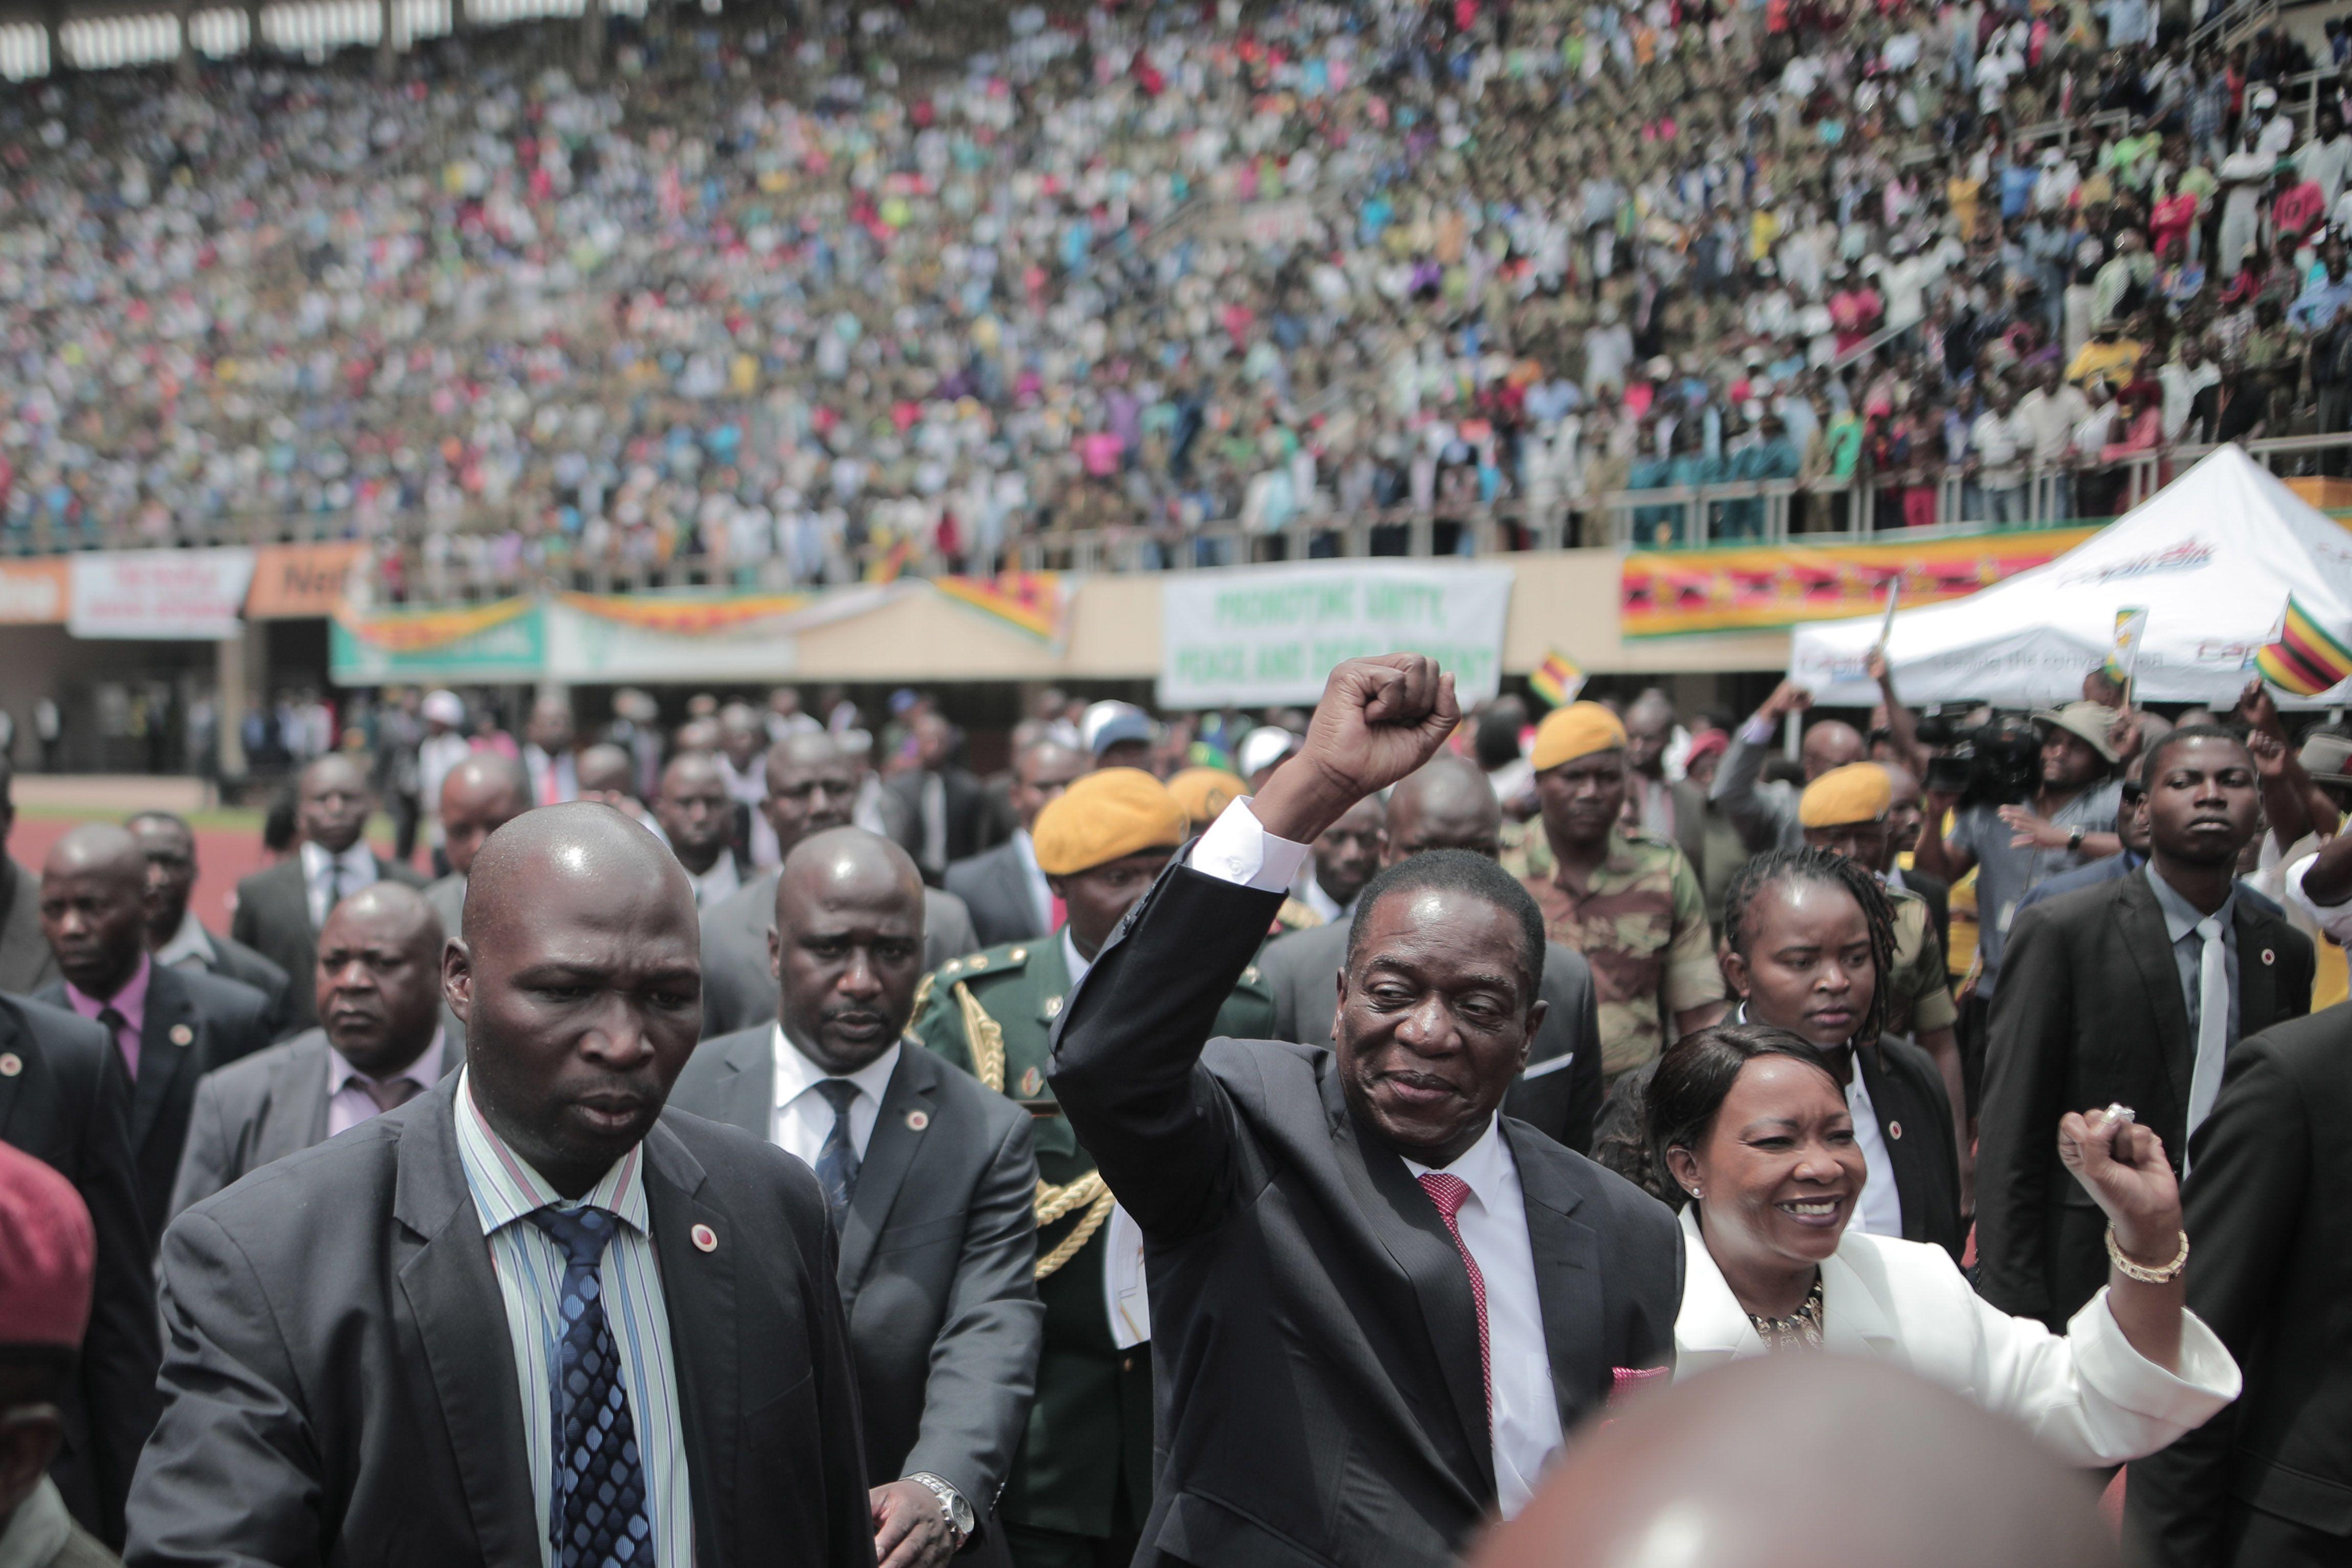 President EmmersonMnangagwa greets Zimbabweans during his inauguration ceremony on Nov. 24, 2017.